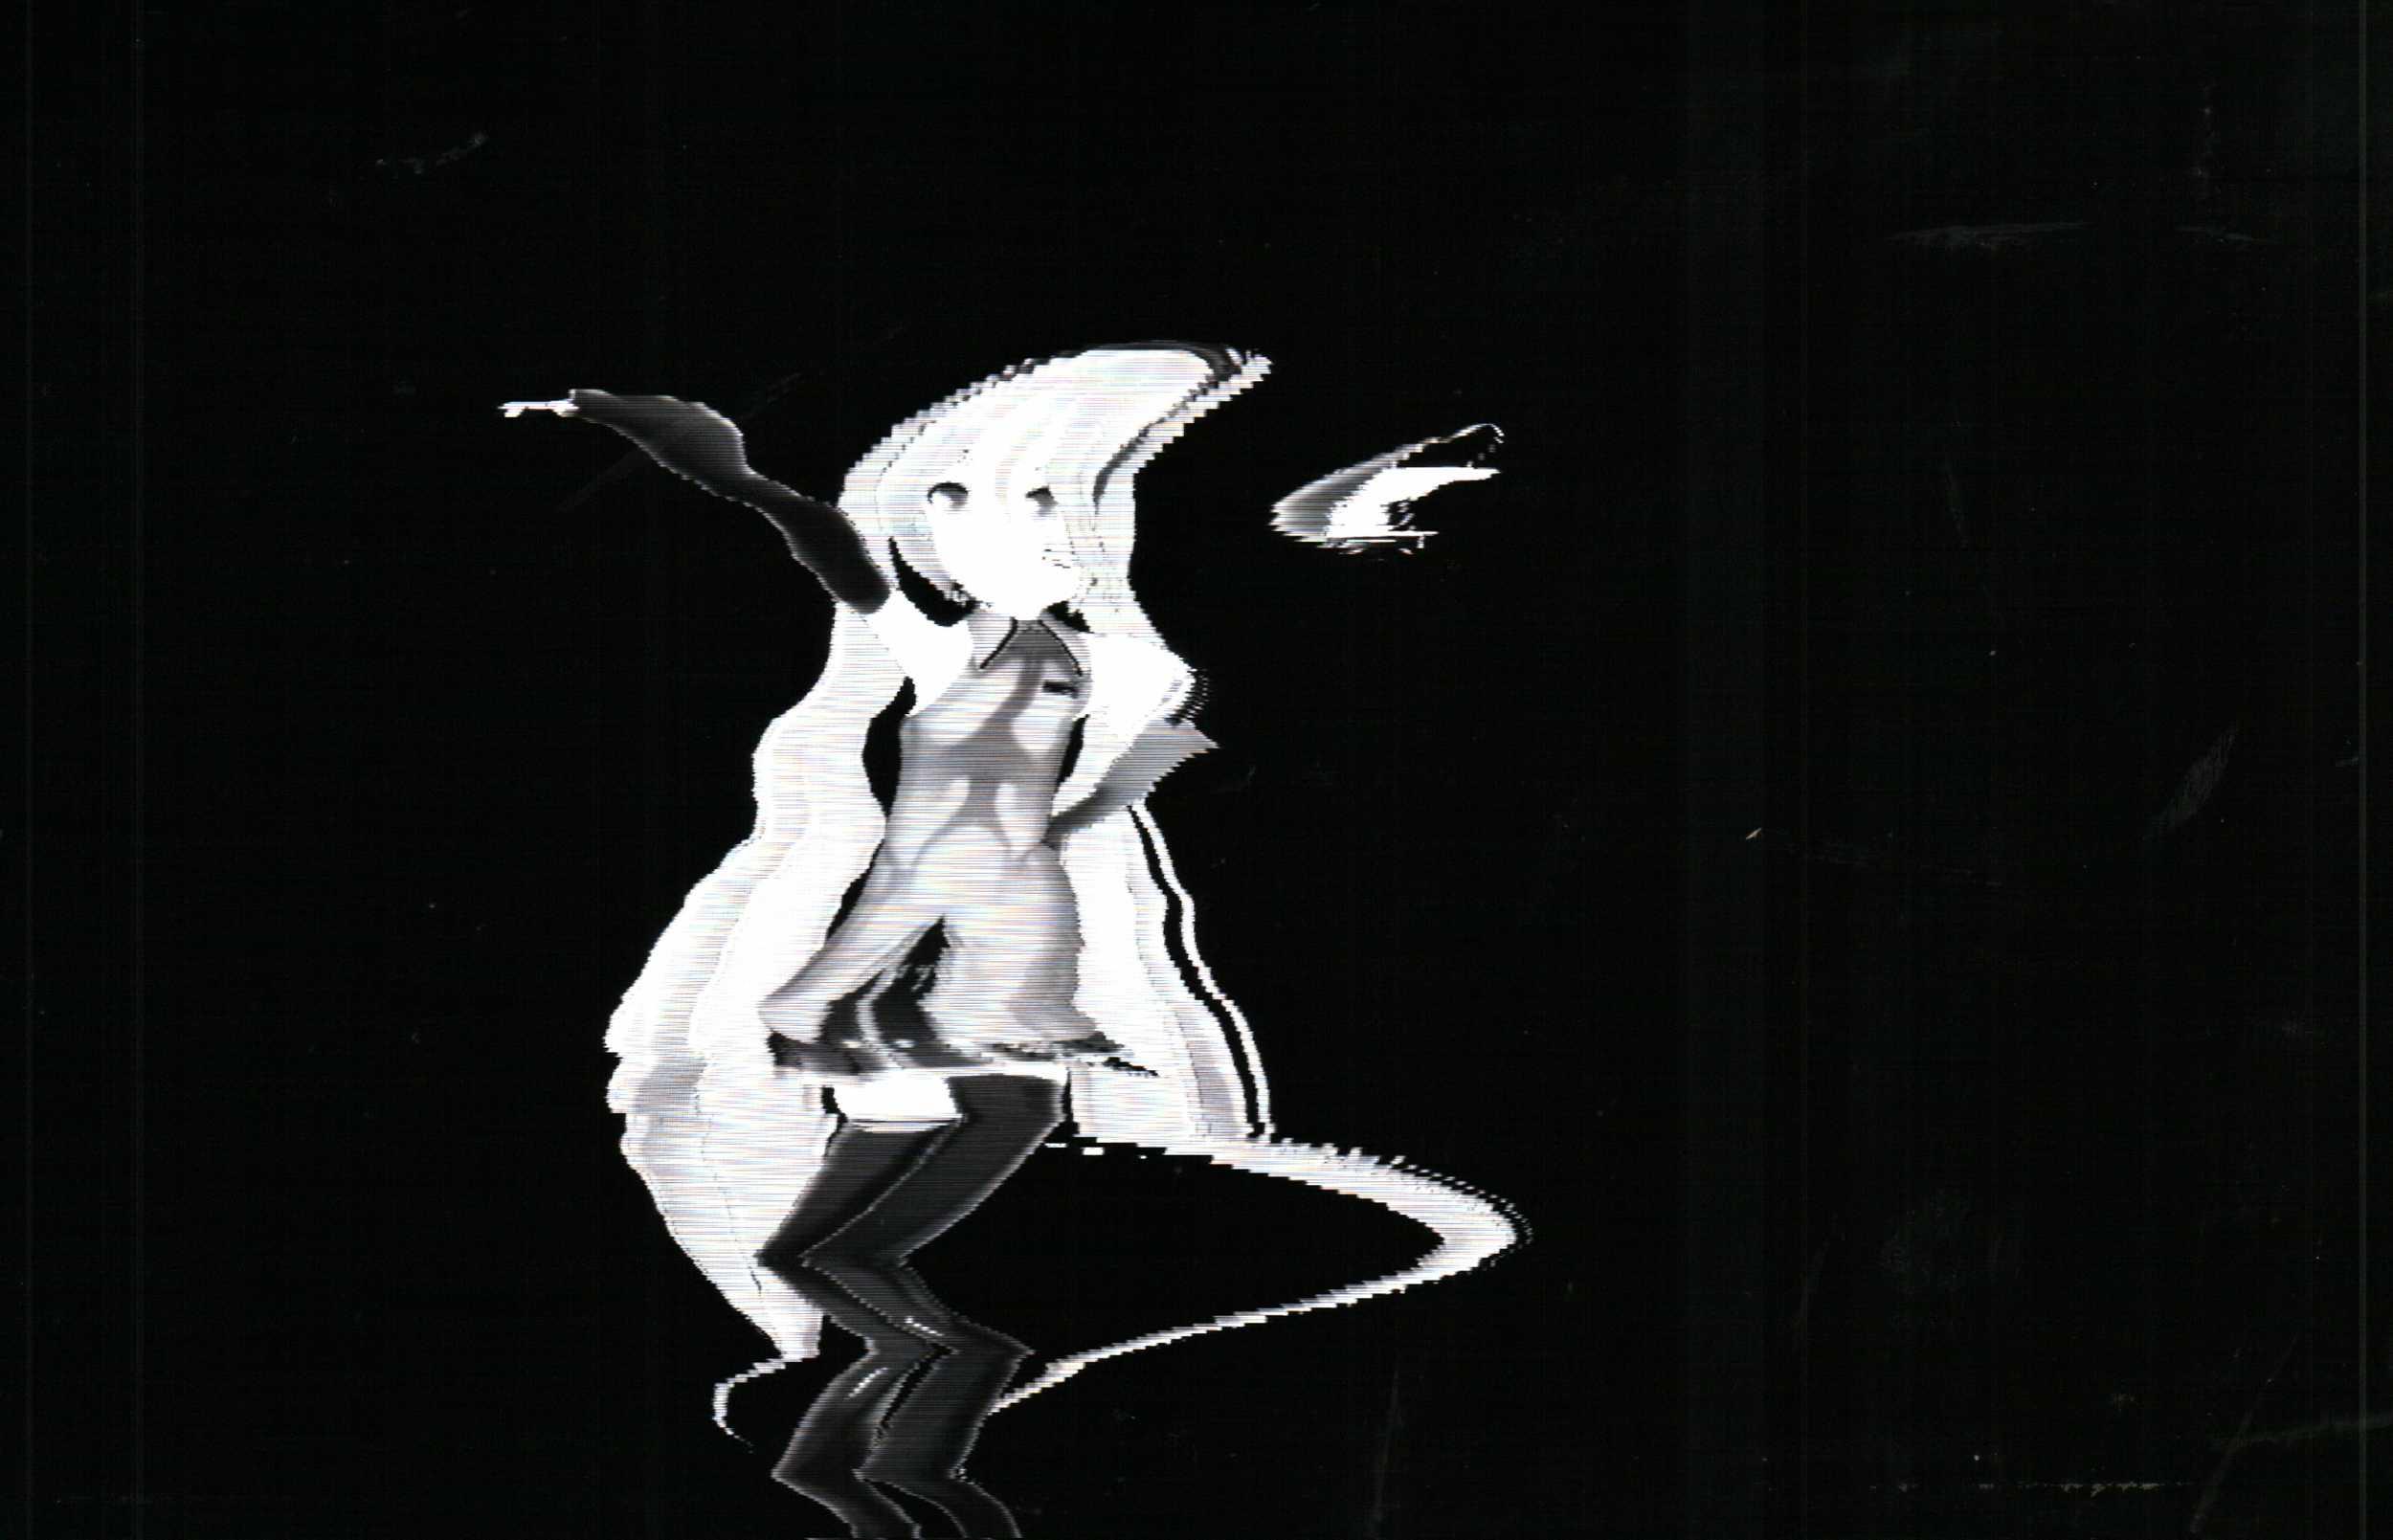 Miku Scan IMAG0119,  Digital Image,  Dimensions Variable, 2016